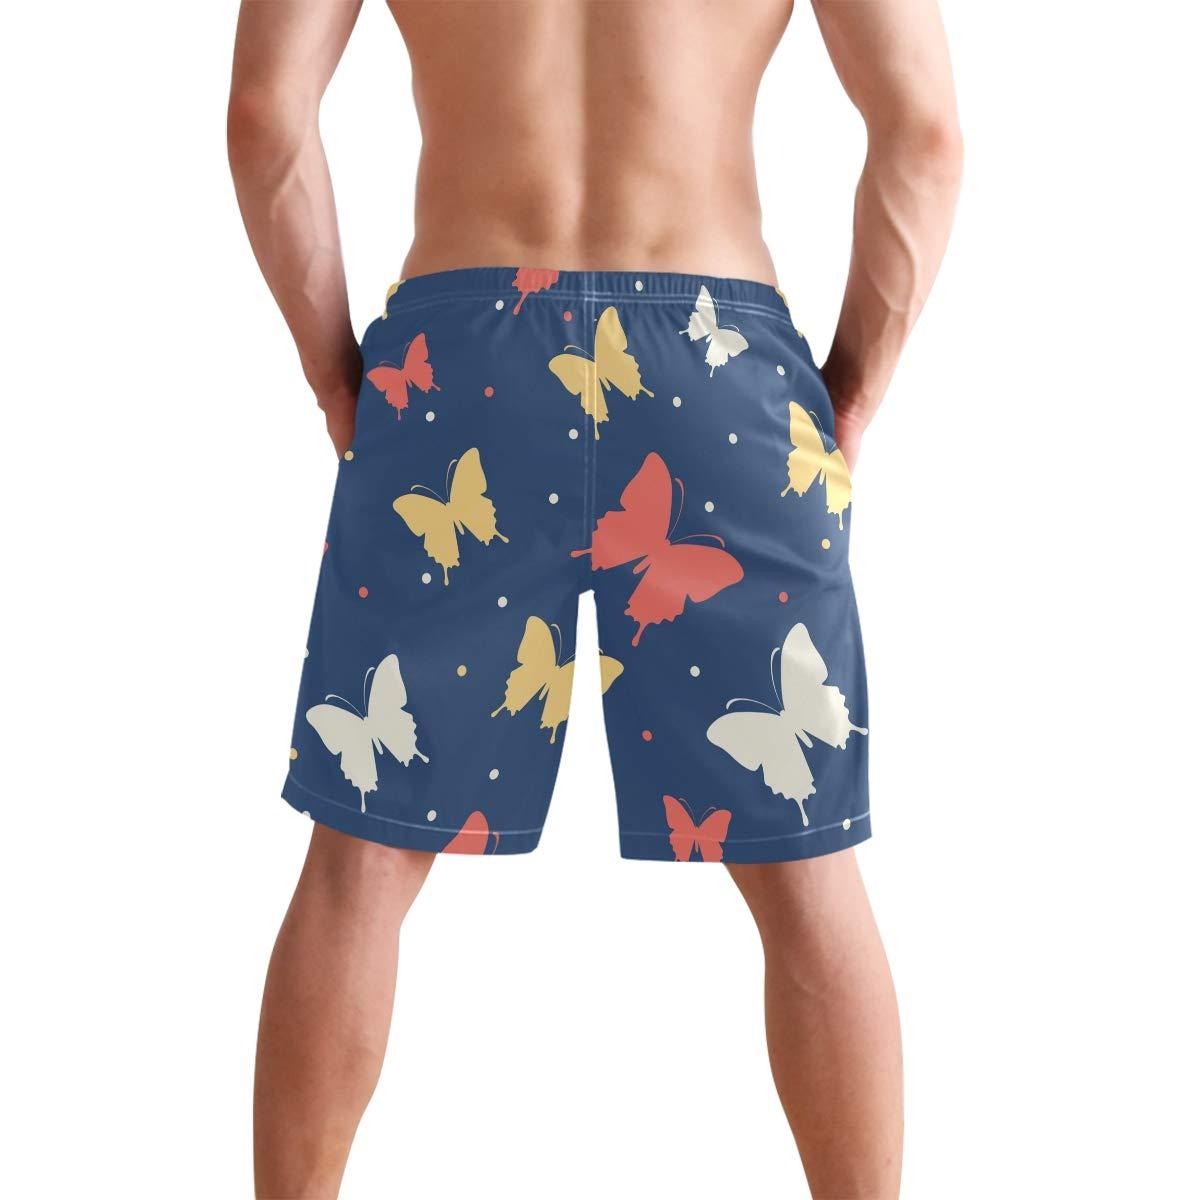 DEYYA Mens Hand Drawn Ink Butterfly Summer Beach Shorts Pants Swim Trunks Board Short for Men